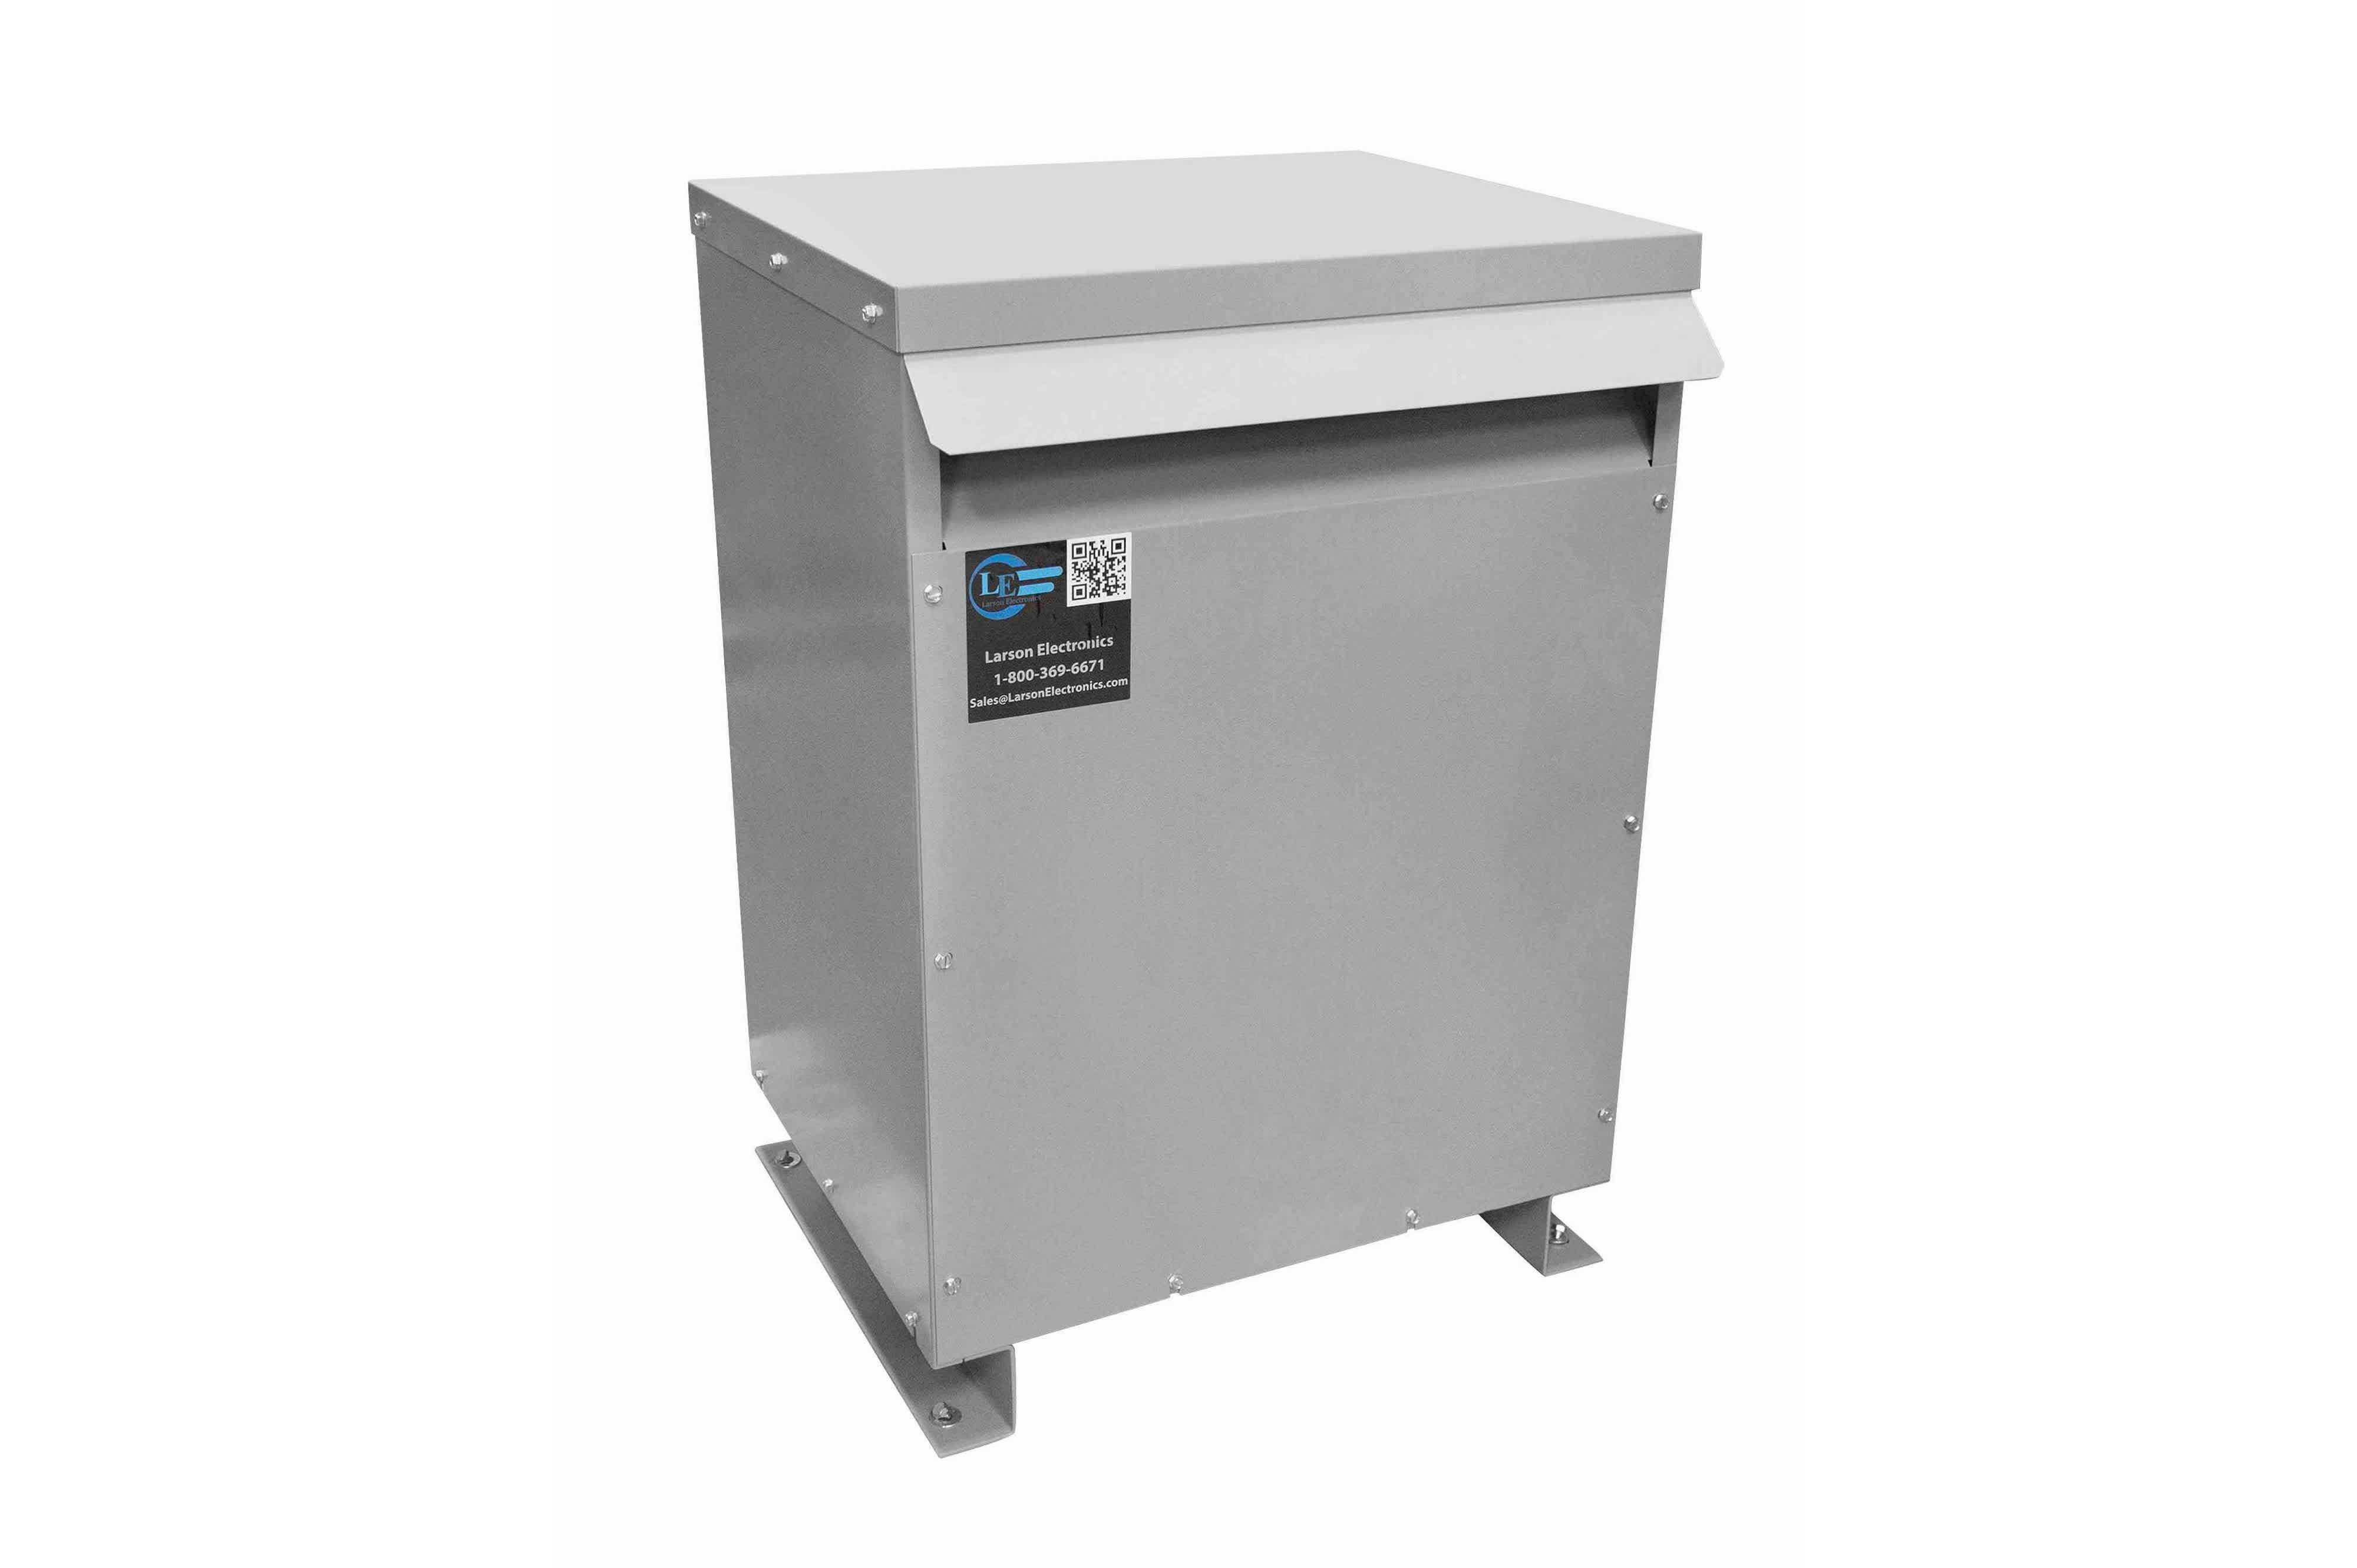 225 kVA 3PH DOE Transformer, 208V Delta Primary, 480Y/277 Wye-N Secondary, N3R, Ventilated, 60 Hz